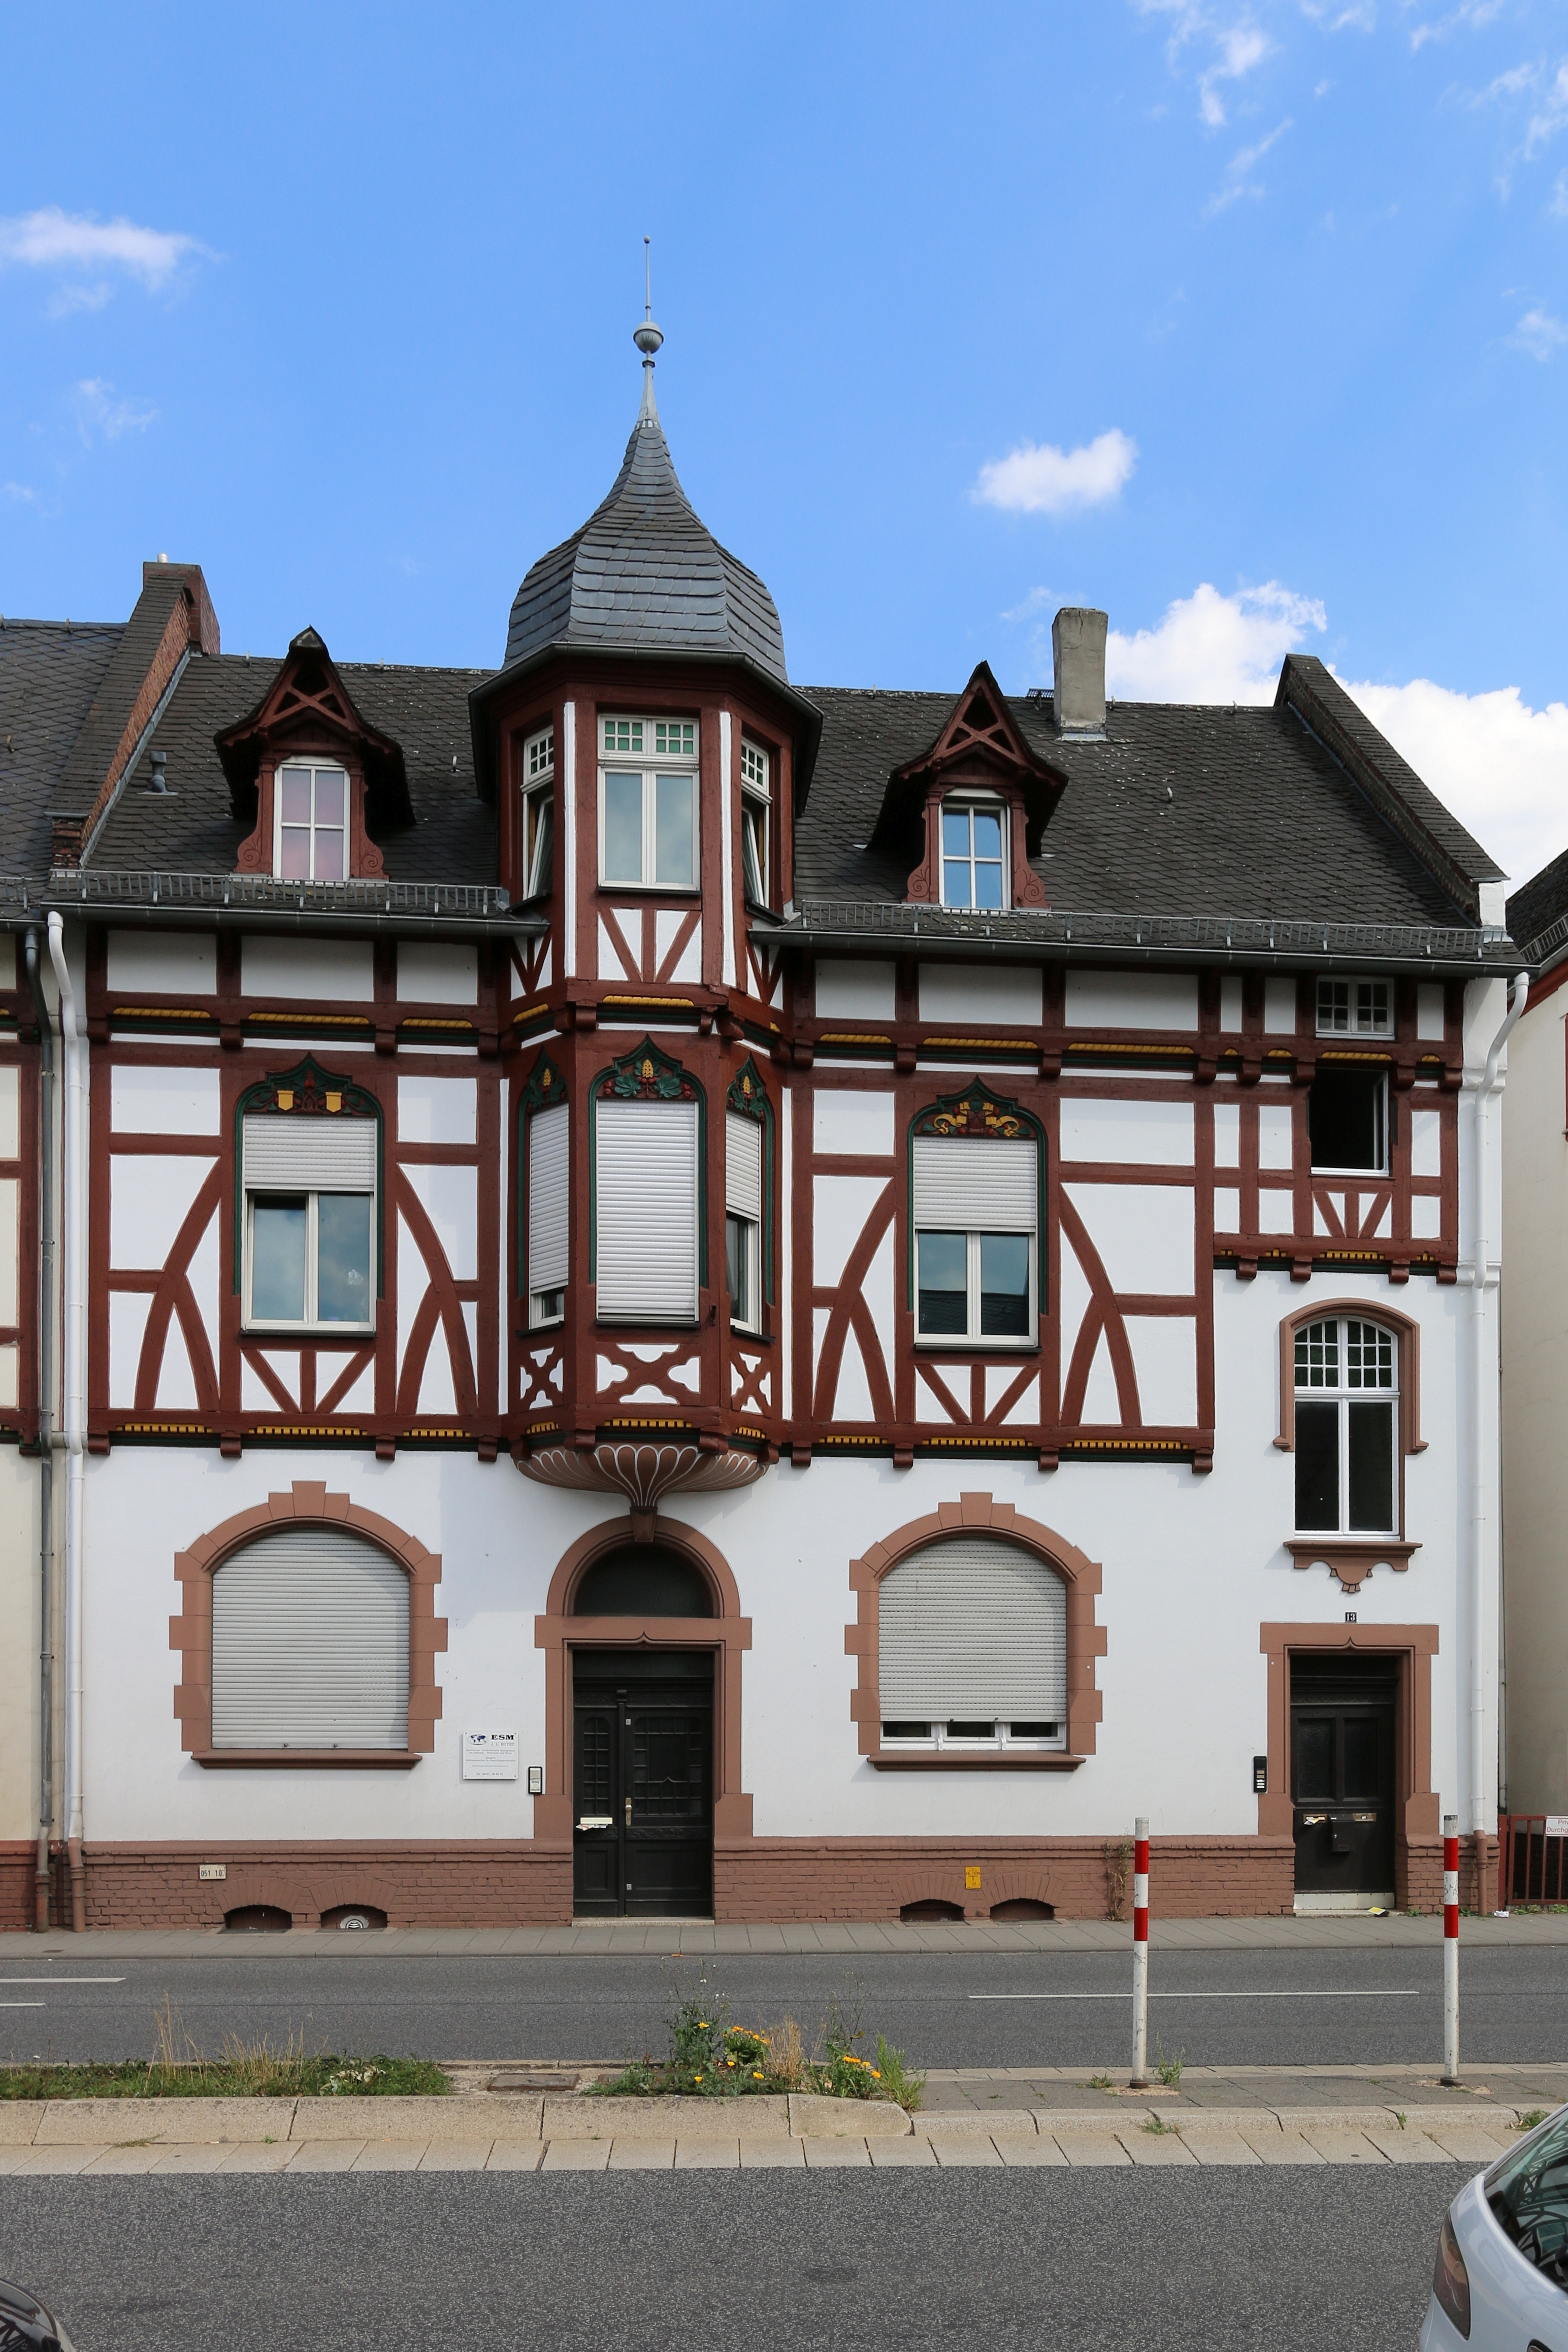 File:Limburg - Schiede 13 Konrad-Kurzbold-Str. 9 (KD.